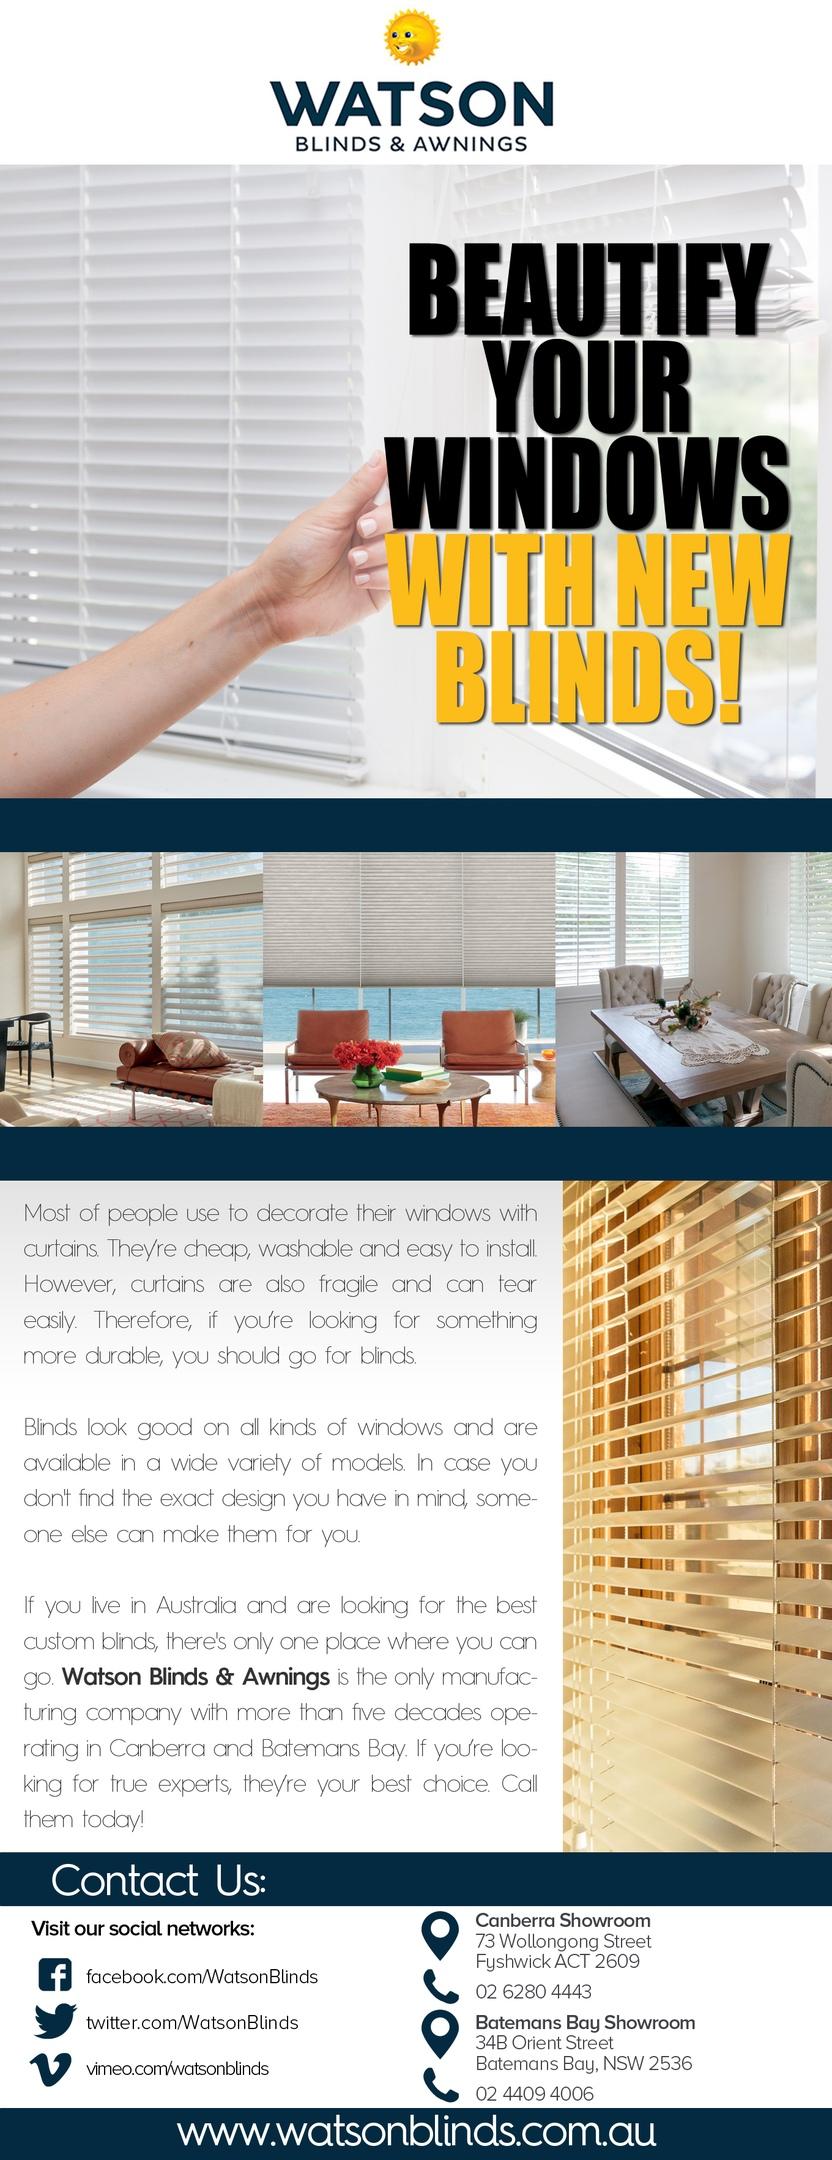 Wide Range of Window Furnishings